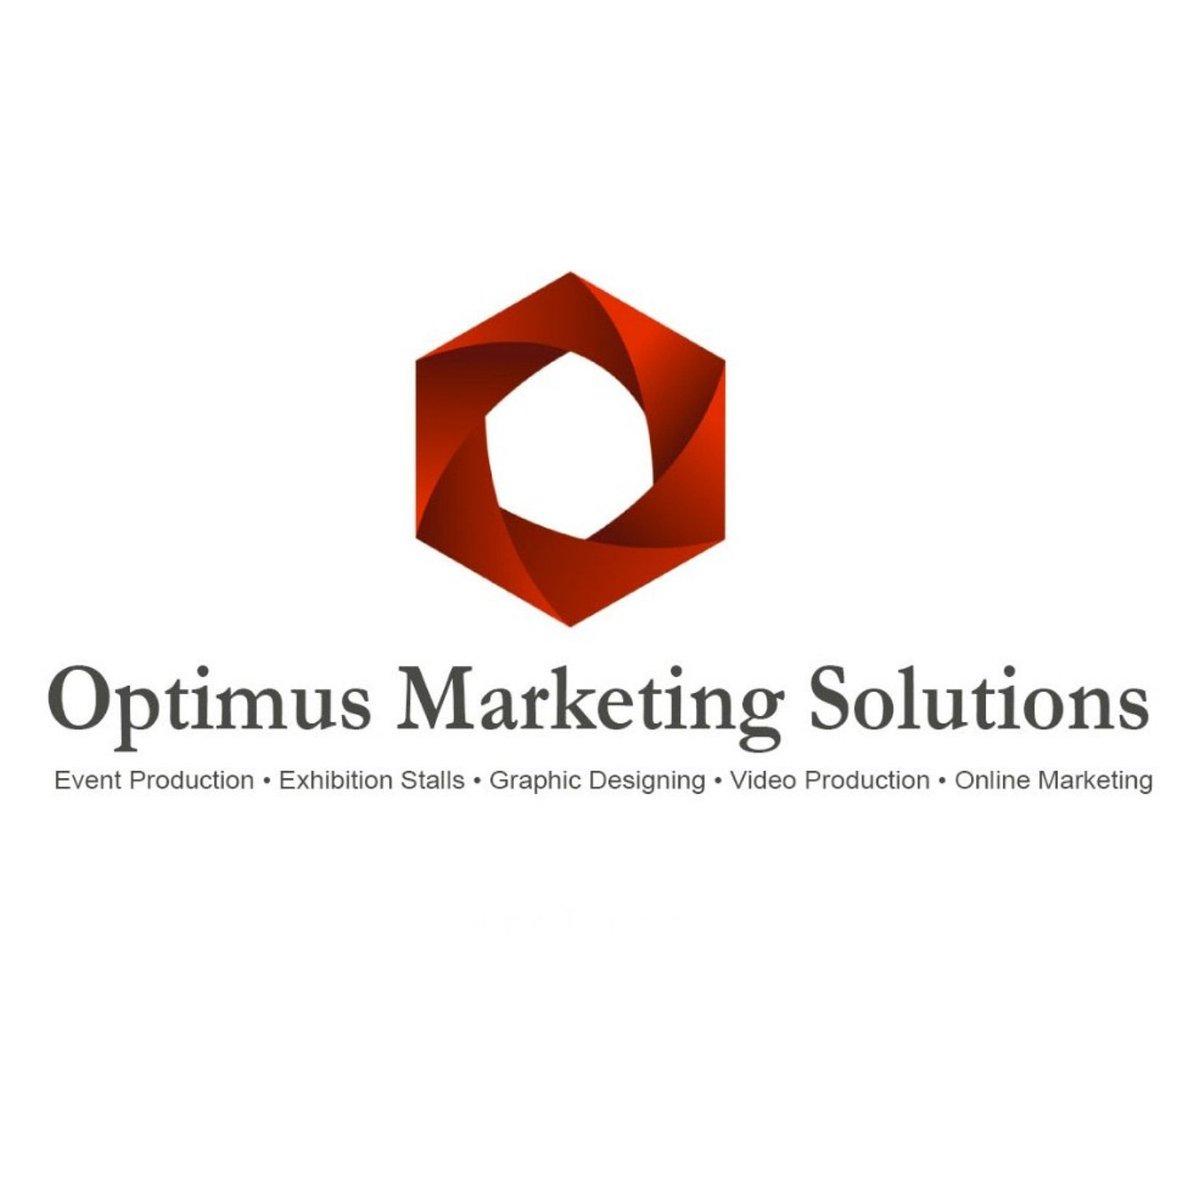 Optimus Marketing Solutions (@Optimusmarketin) | Twitter